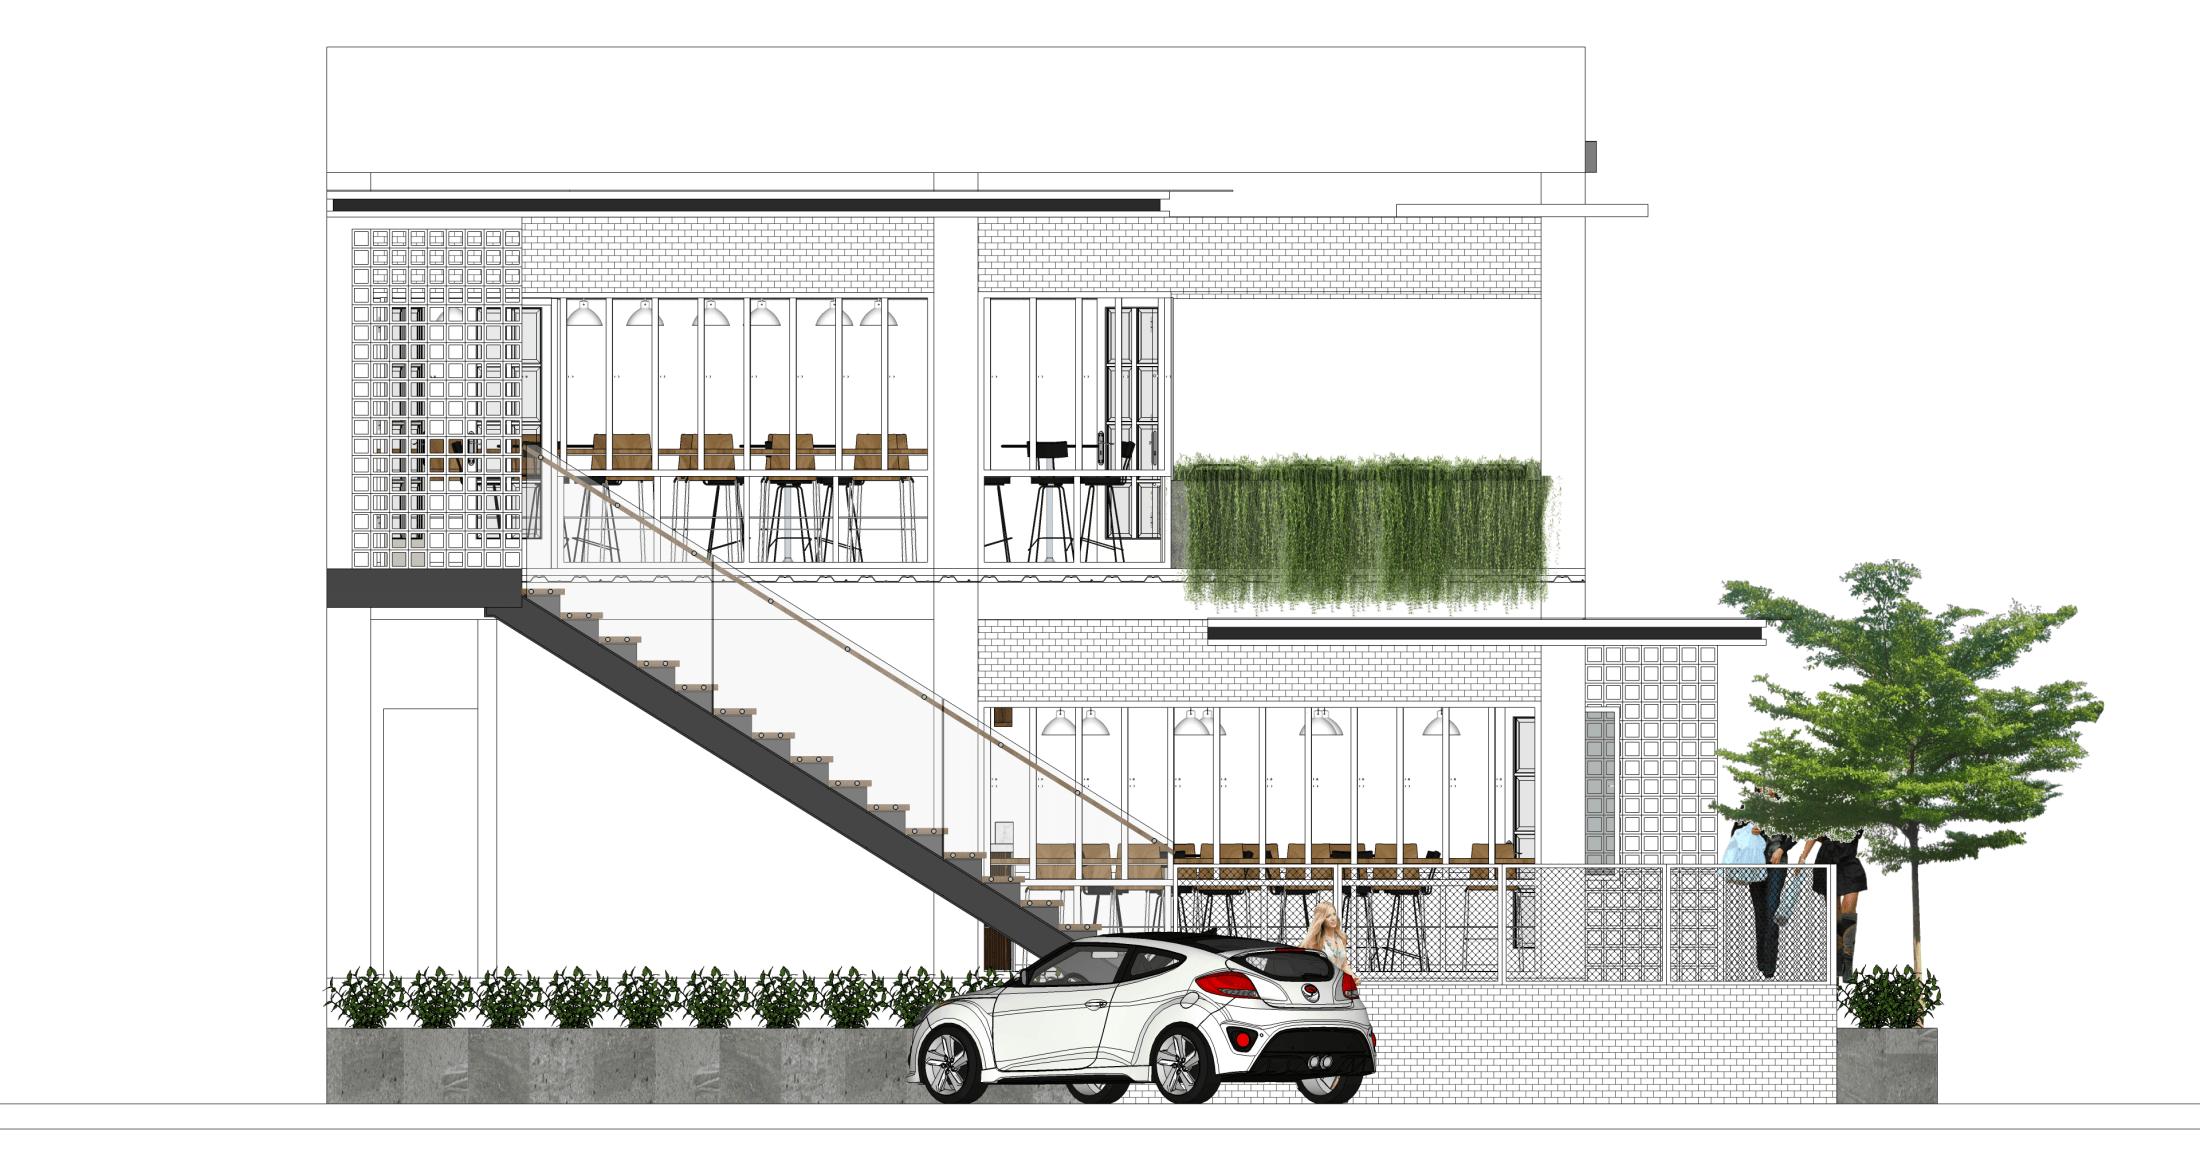 Astabumi Studio Institut Kopi Tegal Tegal, Kota Tegal, Jawa Tengah, Indonesia Tegal, Kota Tegal, Jawa Tengah, Indonesia Astabumi-Architect-Interior-Design-Institut-Kopi-Tegal  83515